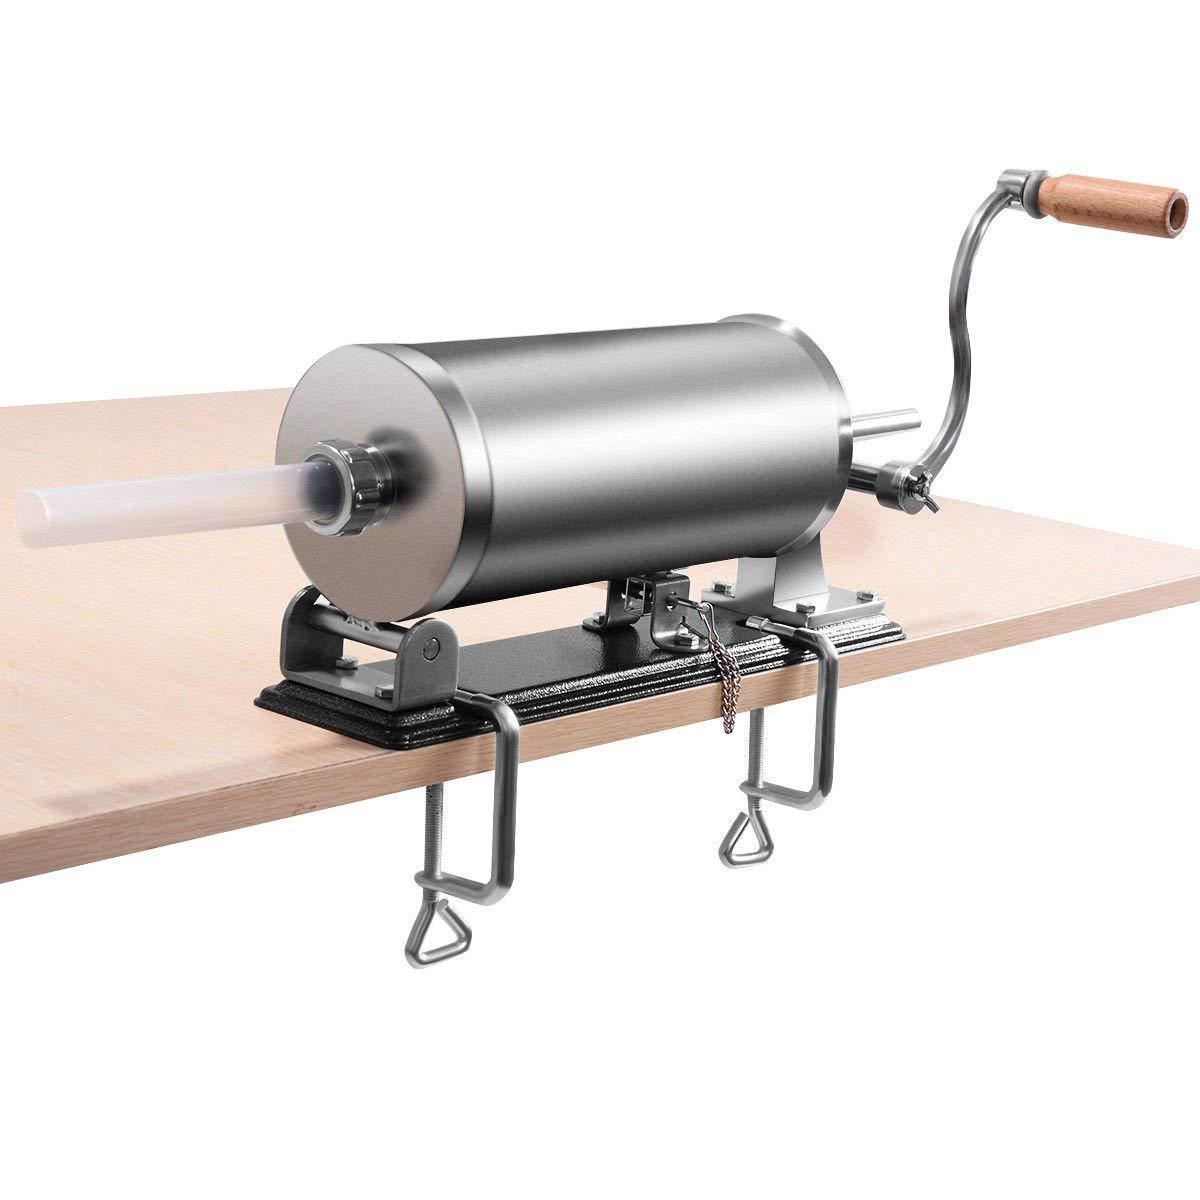 Golflame 3.6L Horizontal Sausage Stuffer Maker for Home Resturant Commercial Stainless Steel Maker Meat Filler Kit